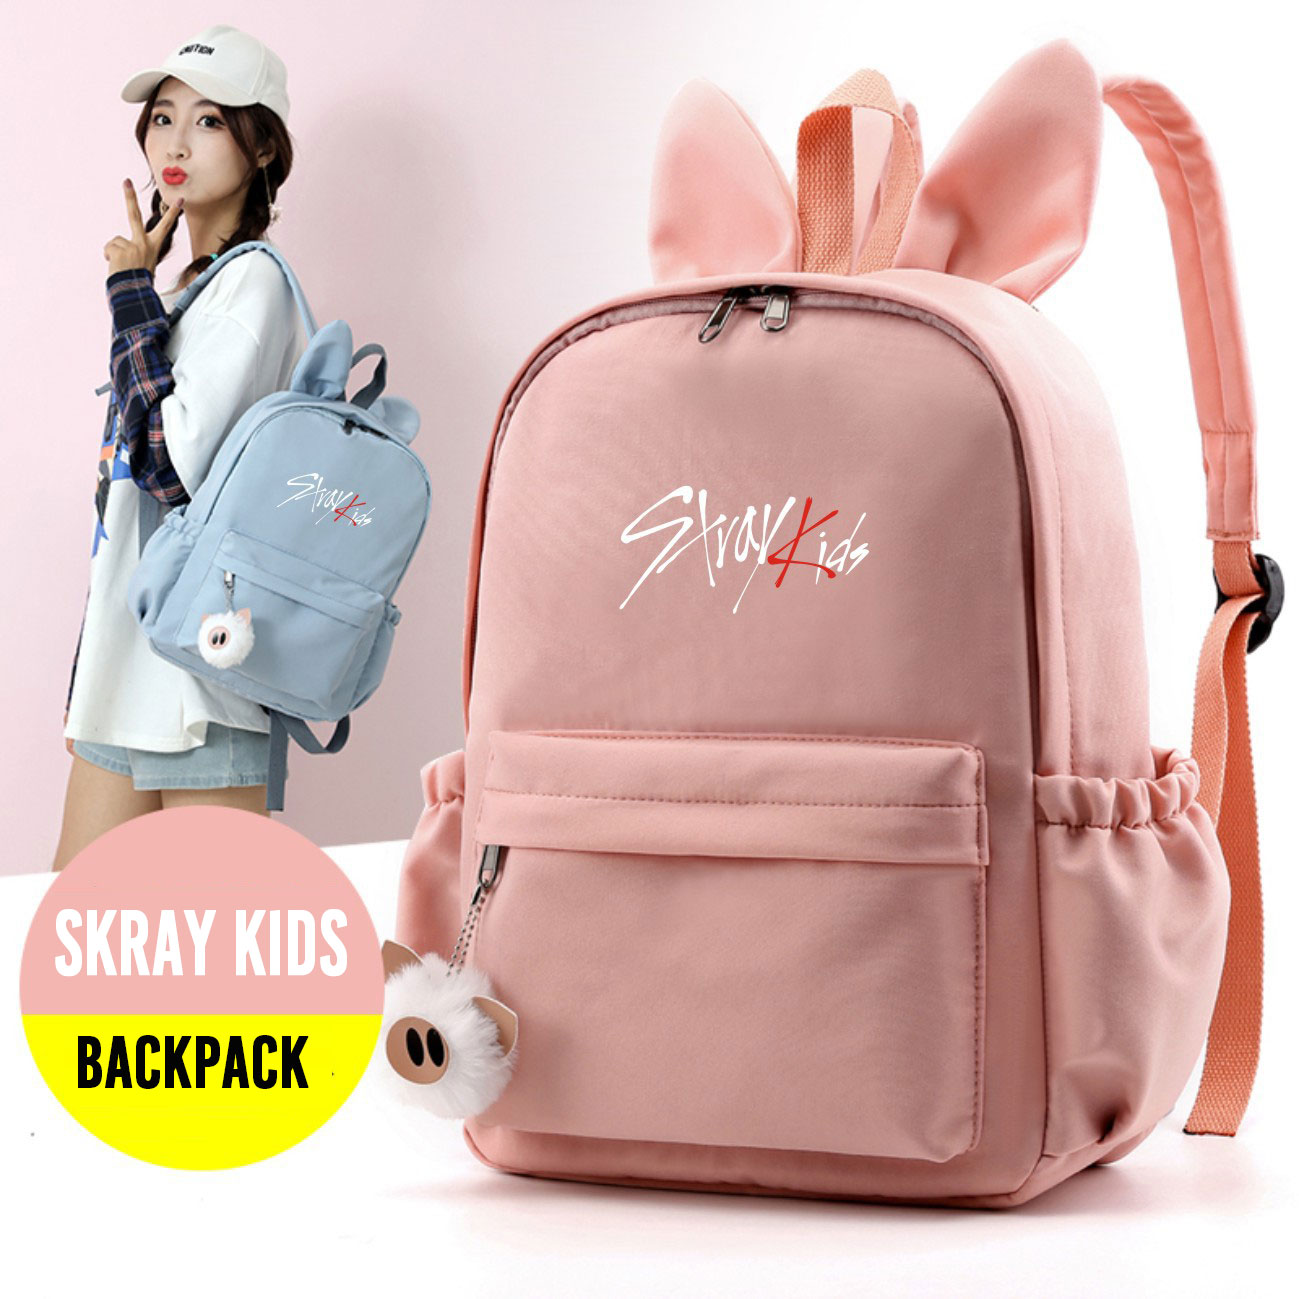 Kpop Stray Kids Backpack Cute Rabbit Ears Schoolbag Back To School Bag Kpop Stray Kids Stationery Set Supplies New Arrivals